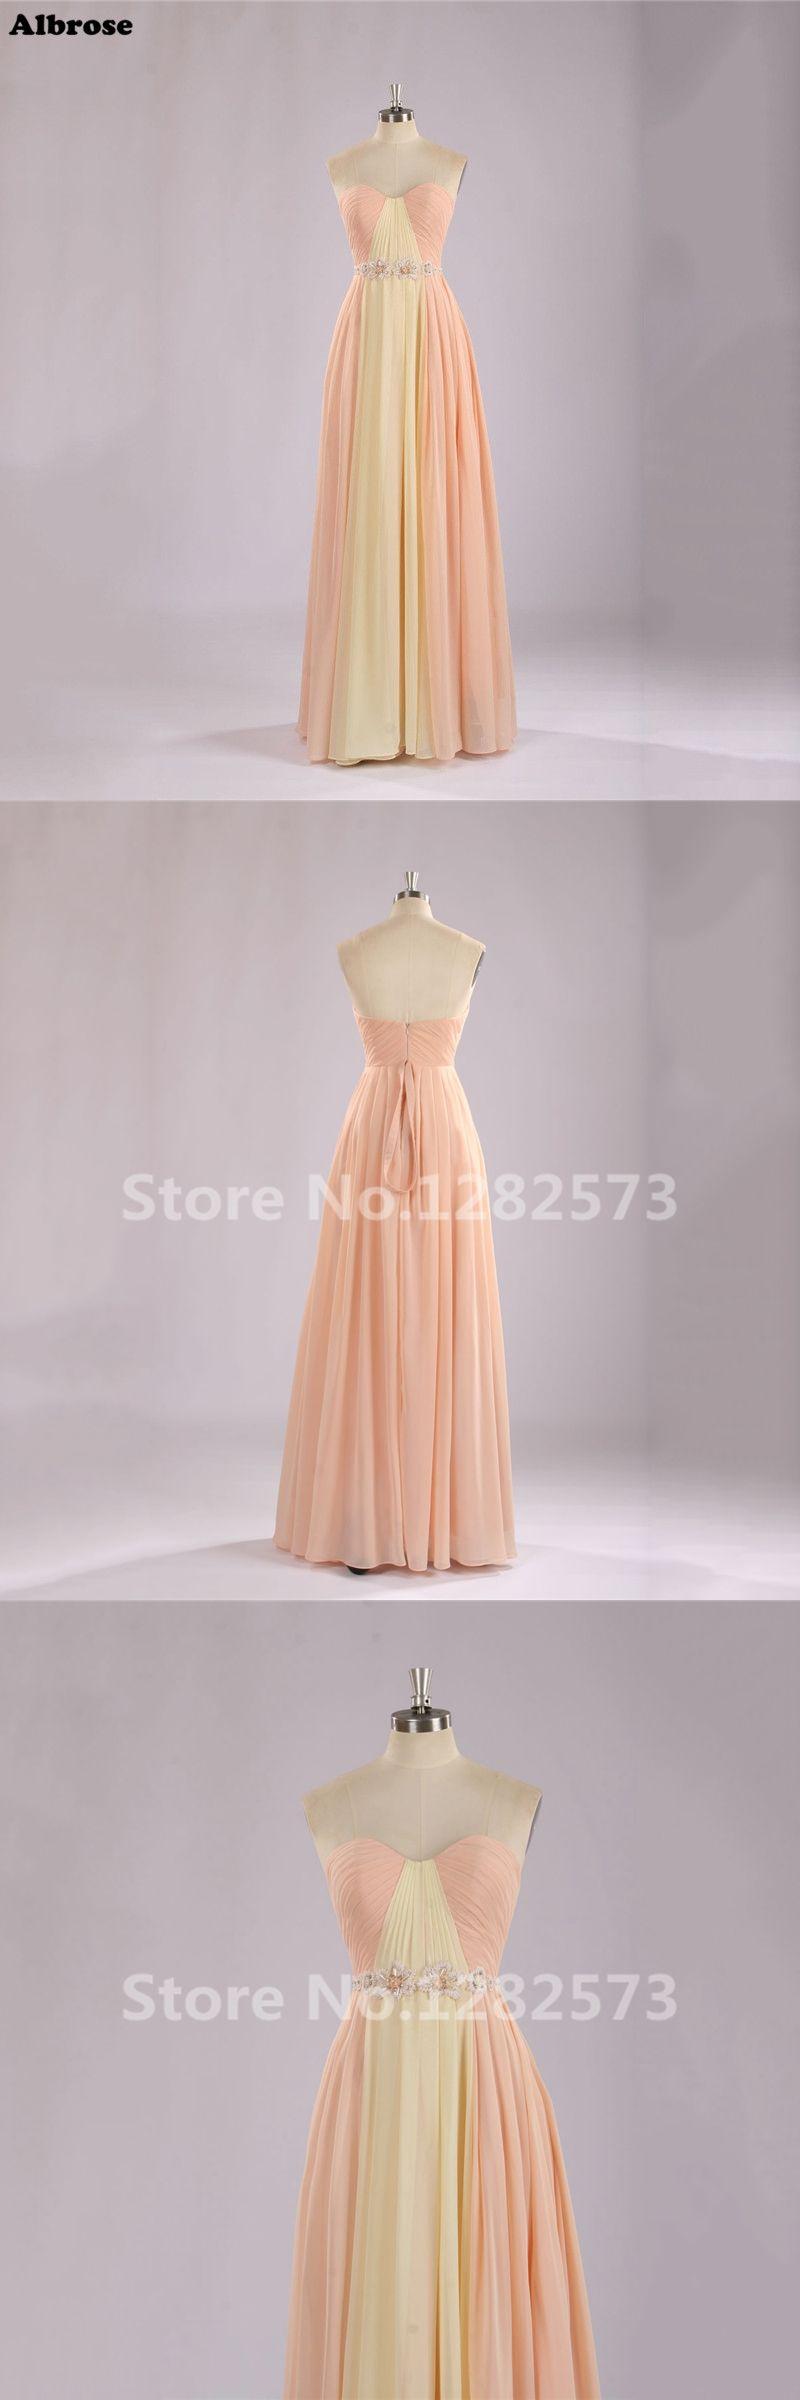 Cheap simple evening dress beaded chiffon contrast color evening